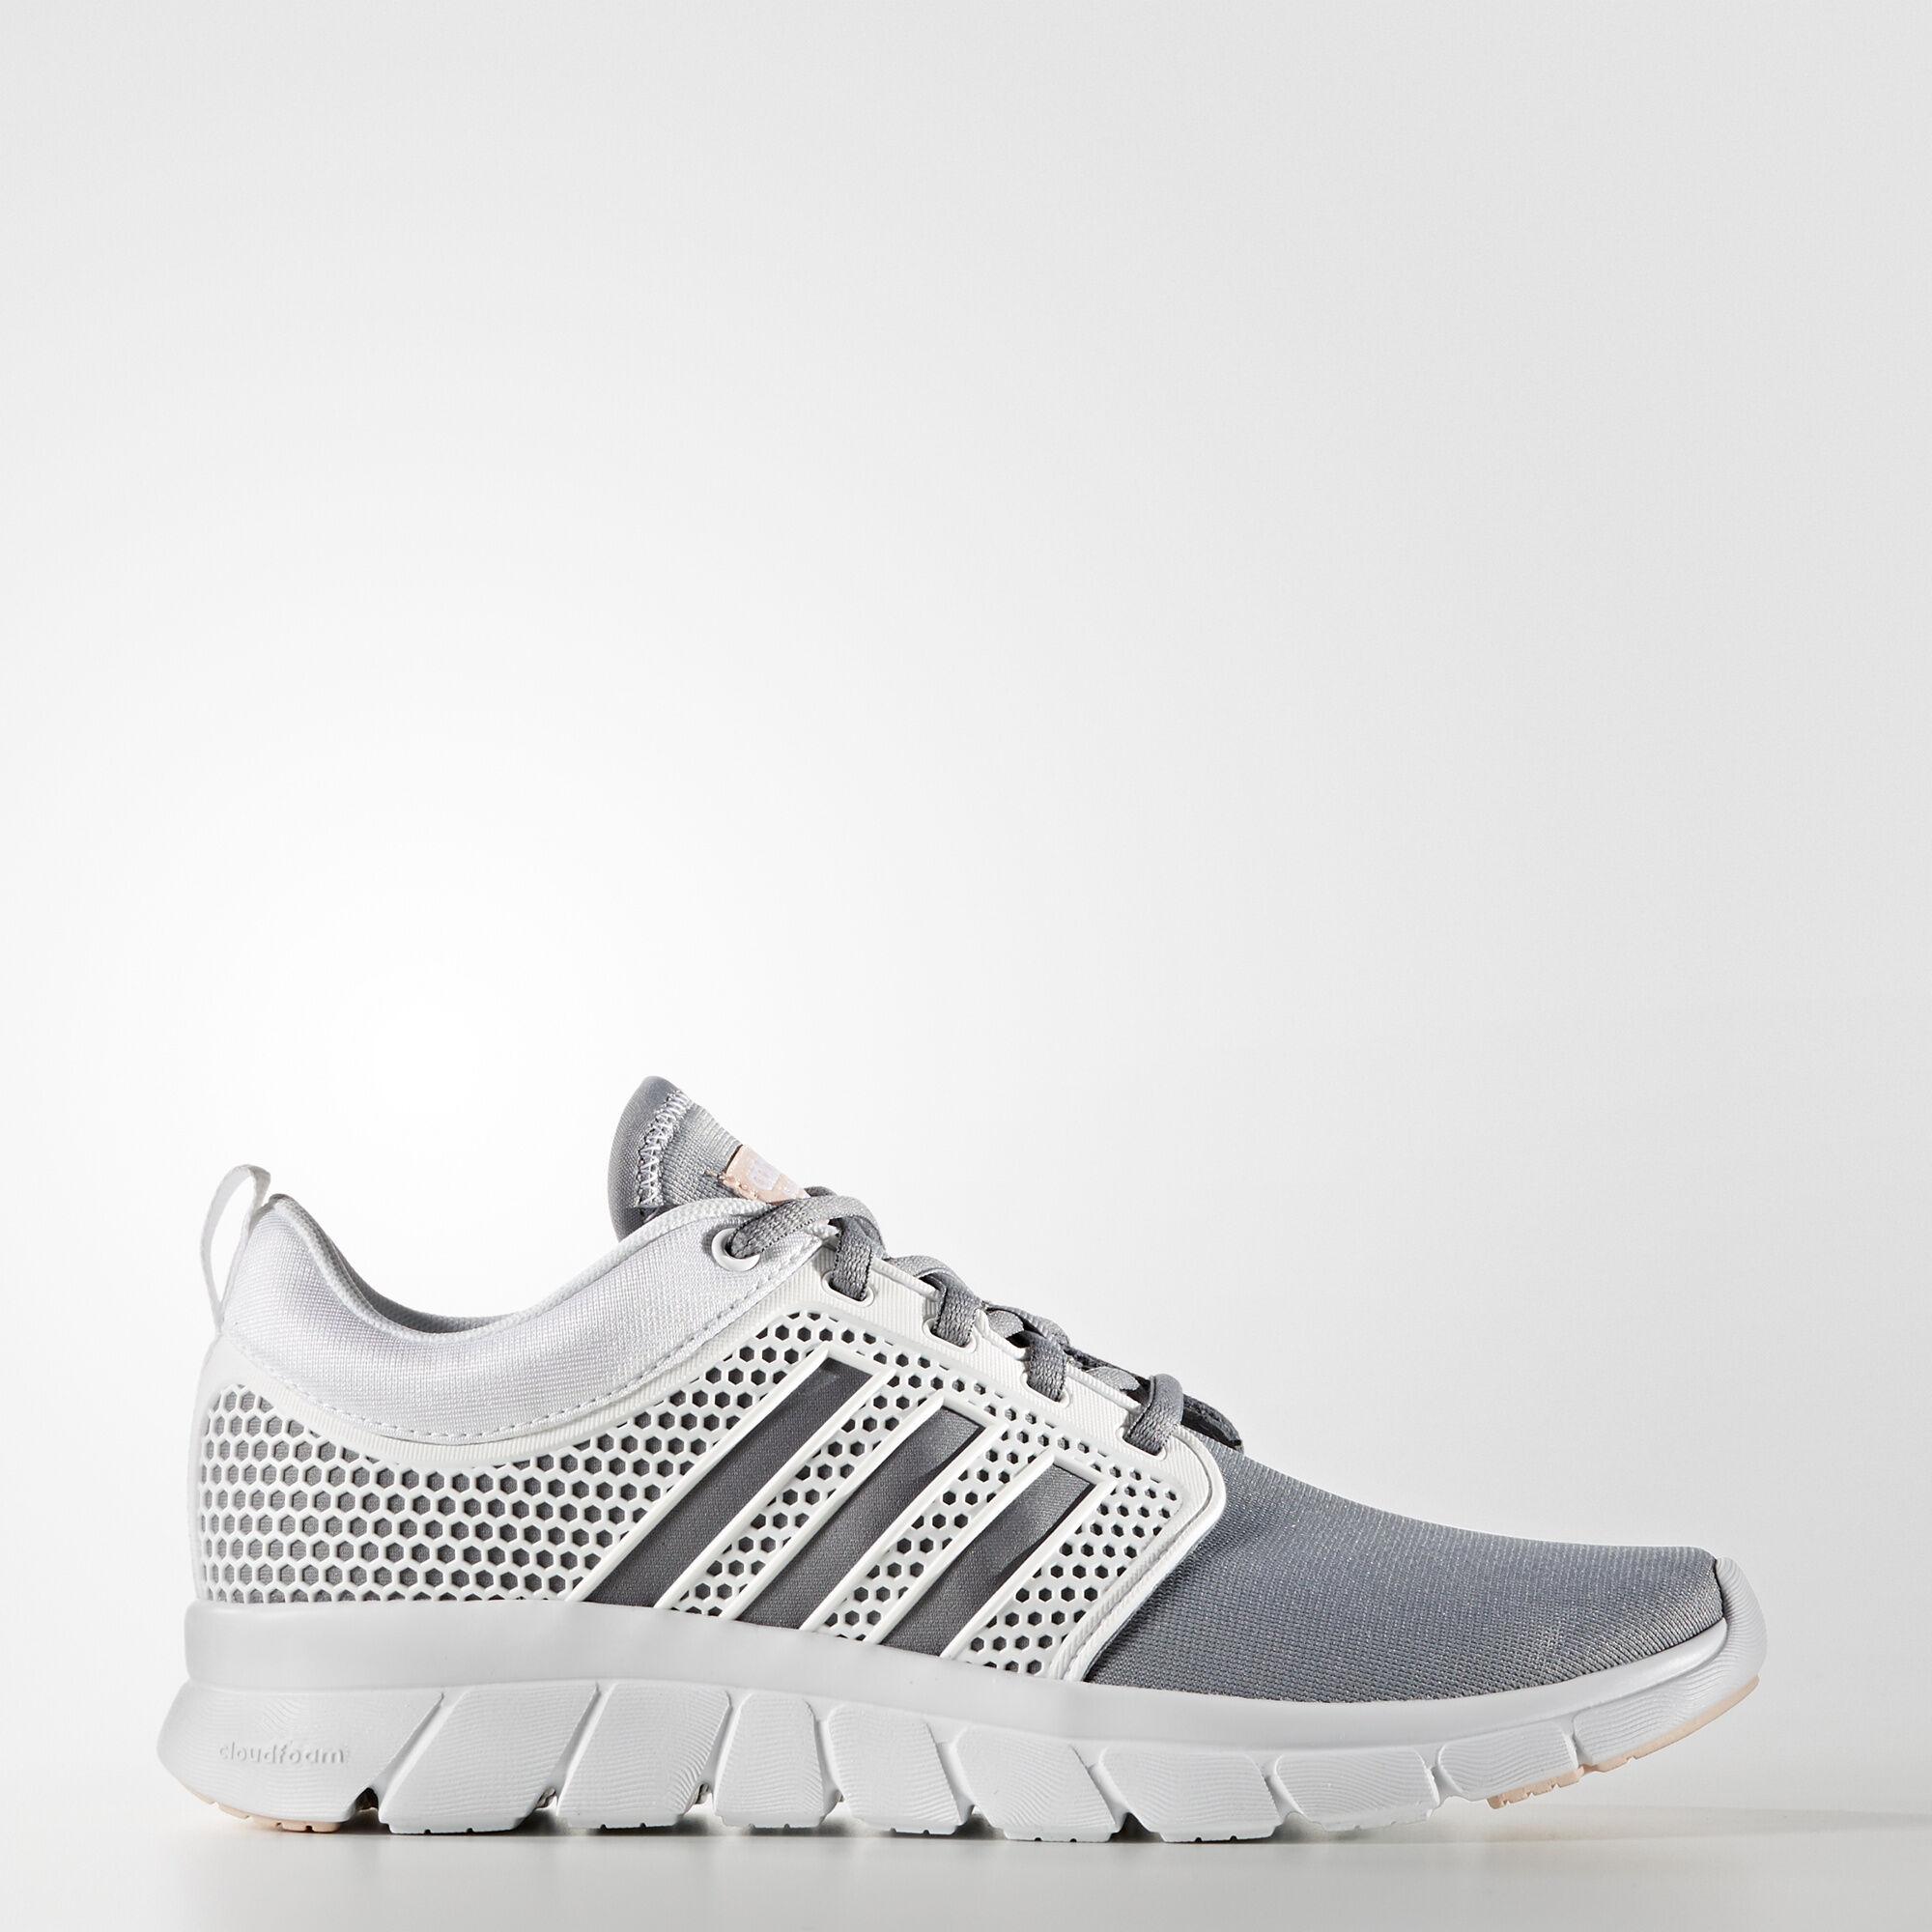 Adidas Cloudfoam Groove